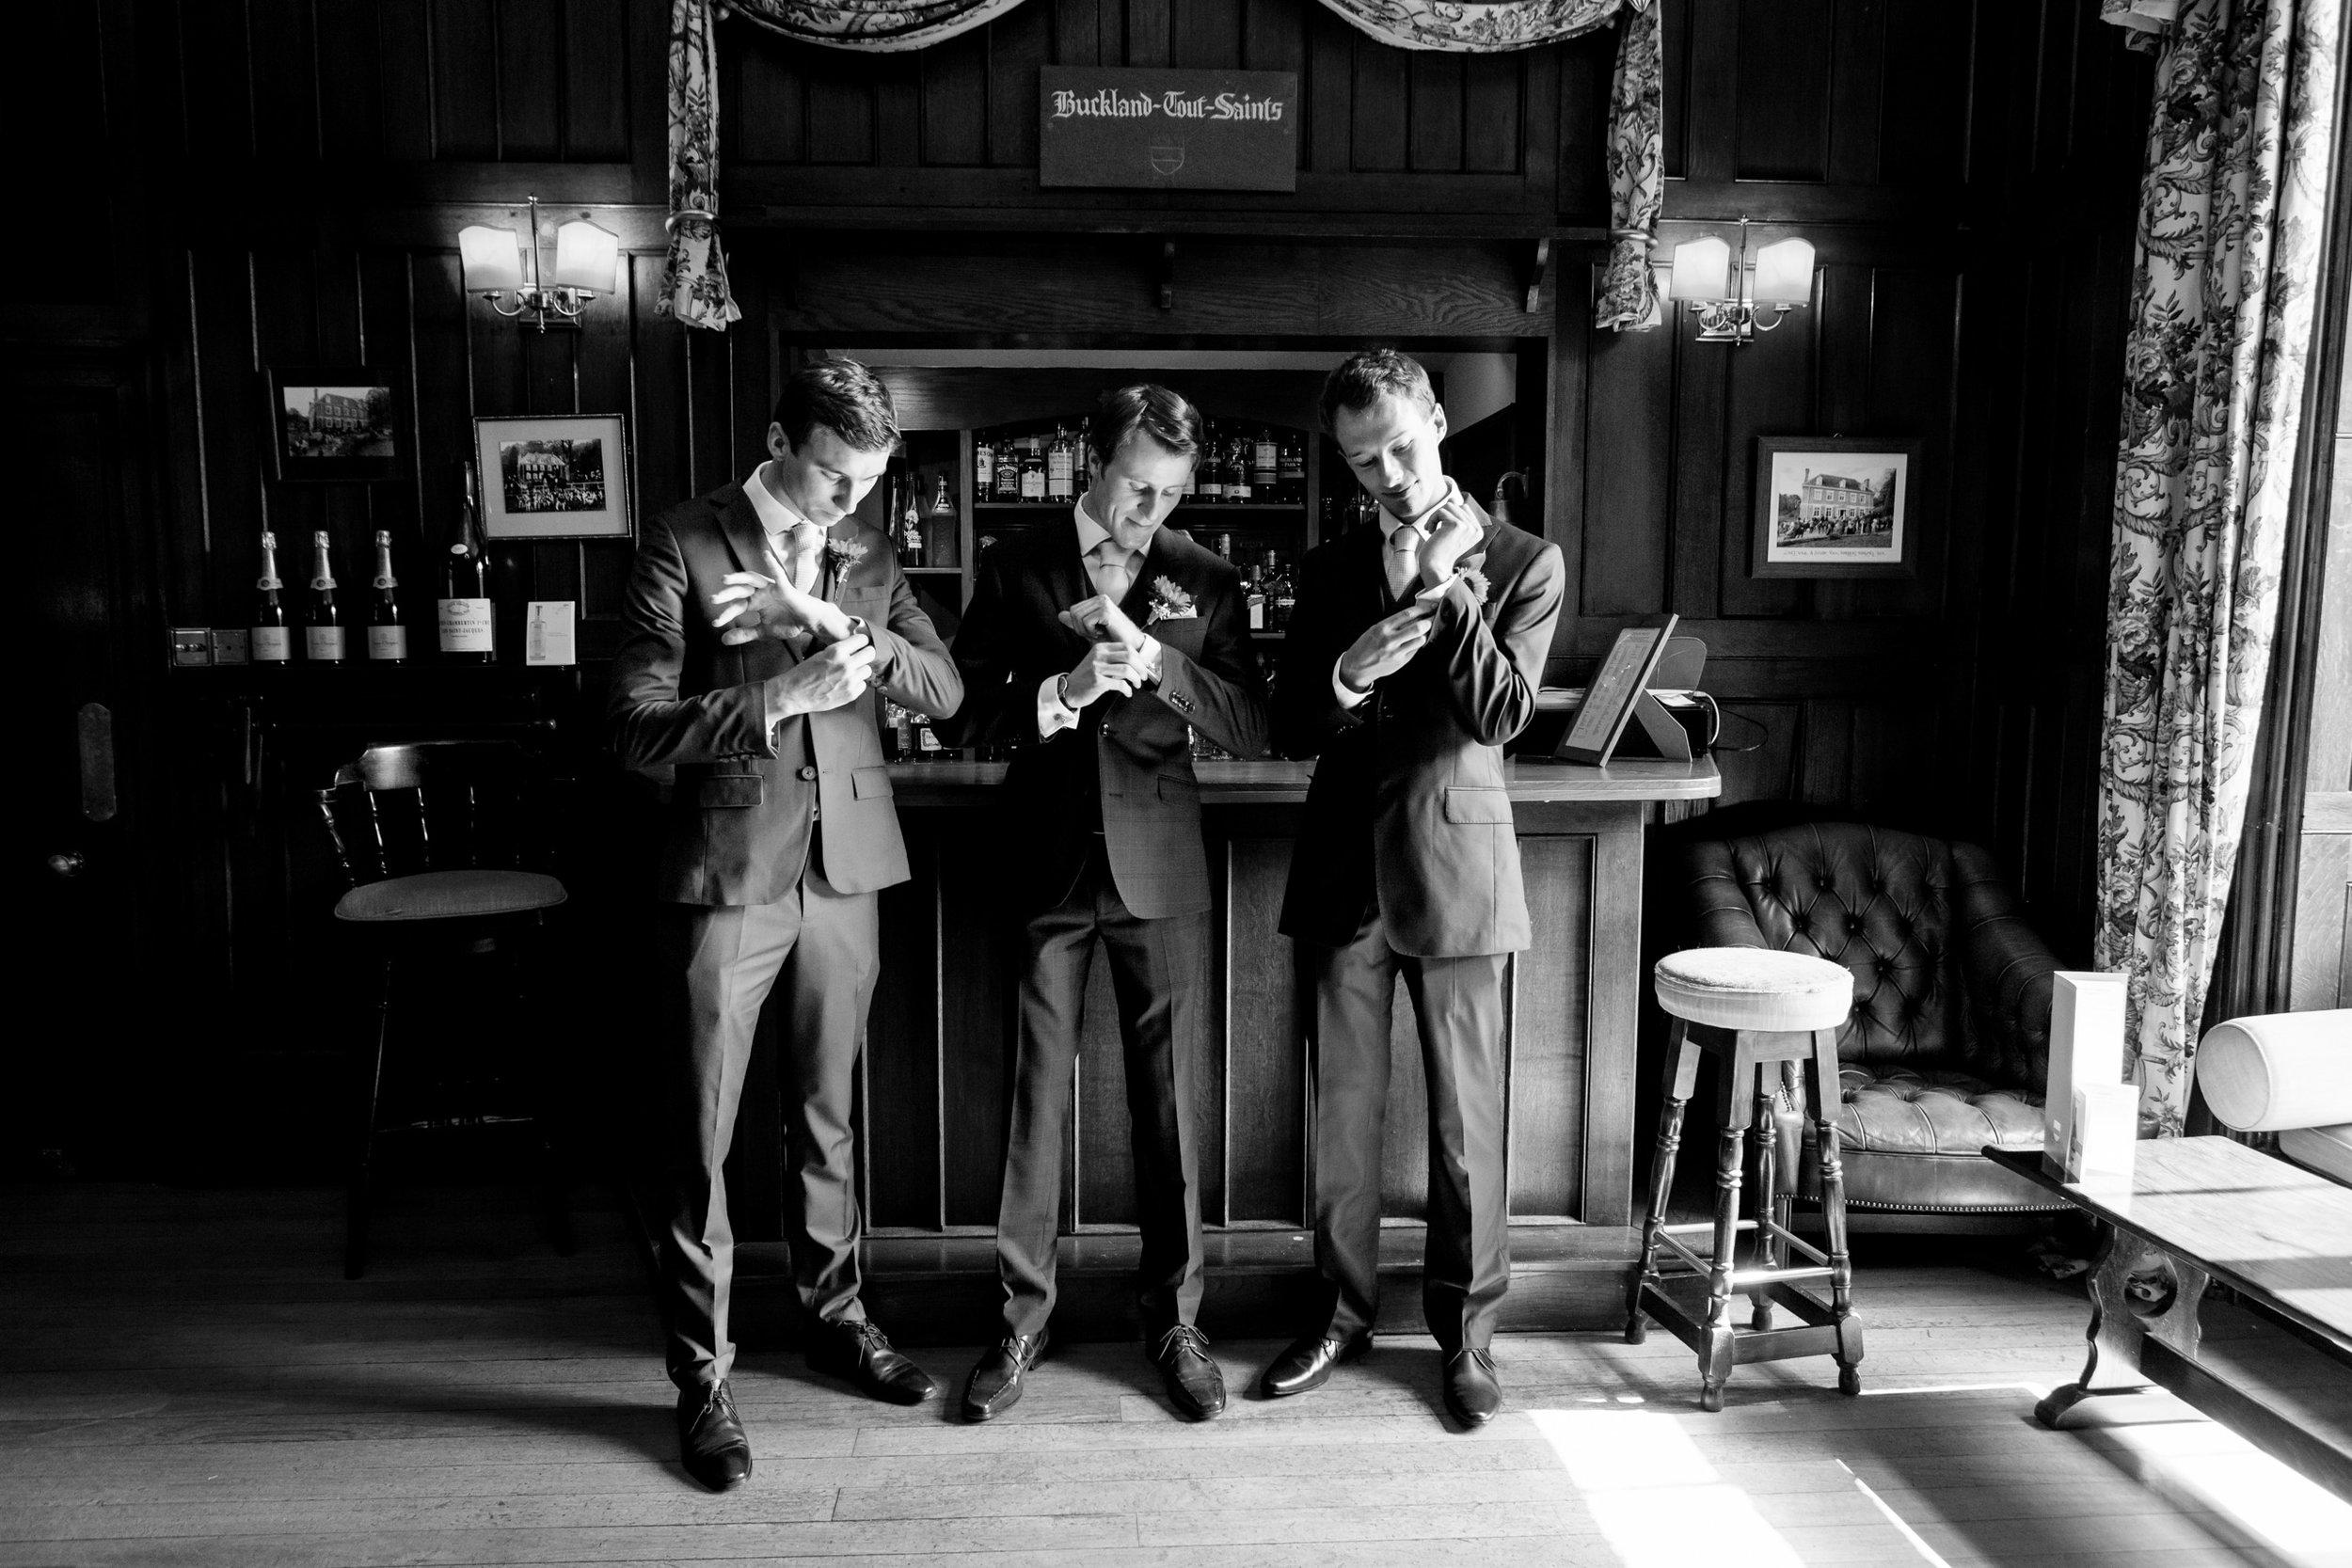 Bucklands-Tout-Saints-Hotel-Devon-Wedding-Photography-9.jpg